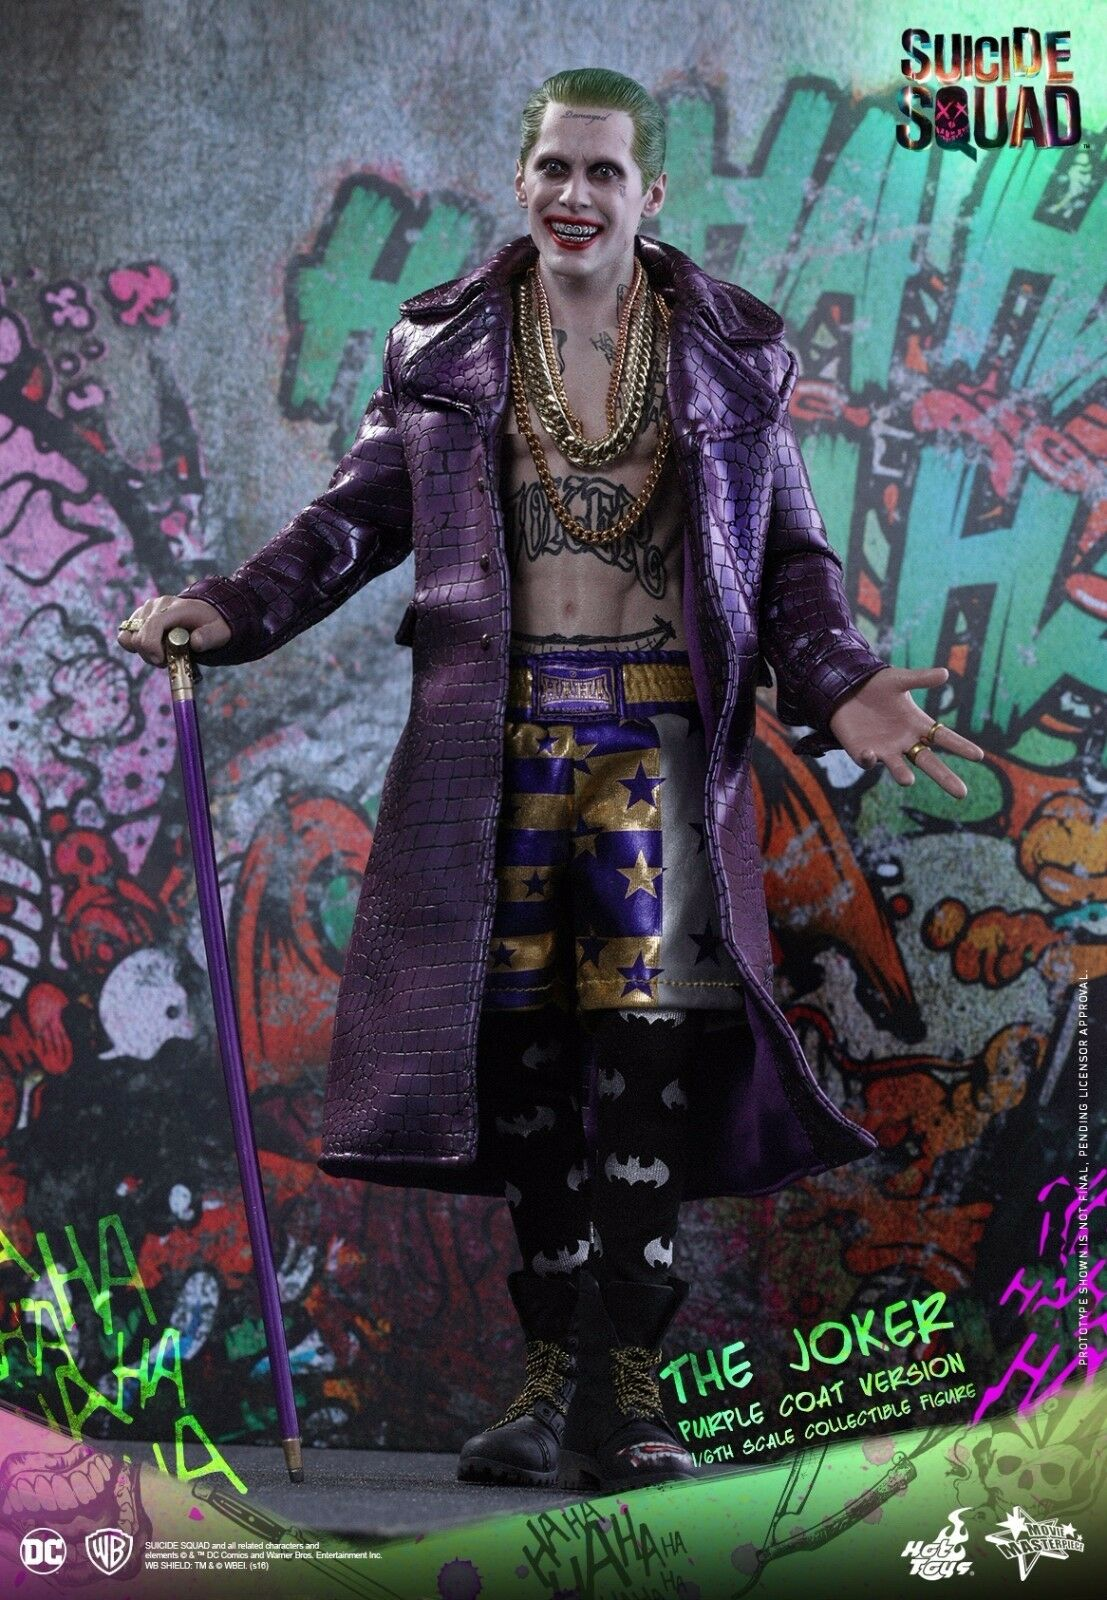 heta leksaker MMS382 Suicide Squad Joker (lila Coat Version) 1  6 FIGURE